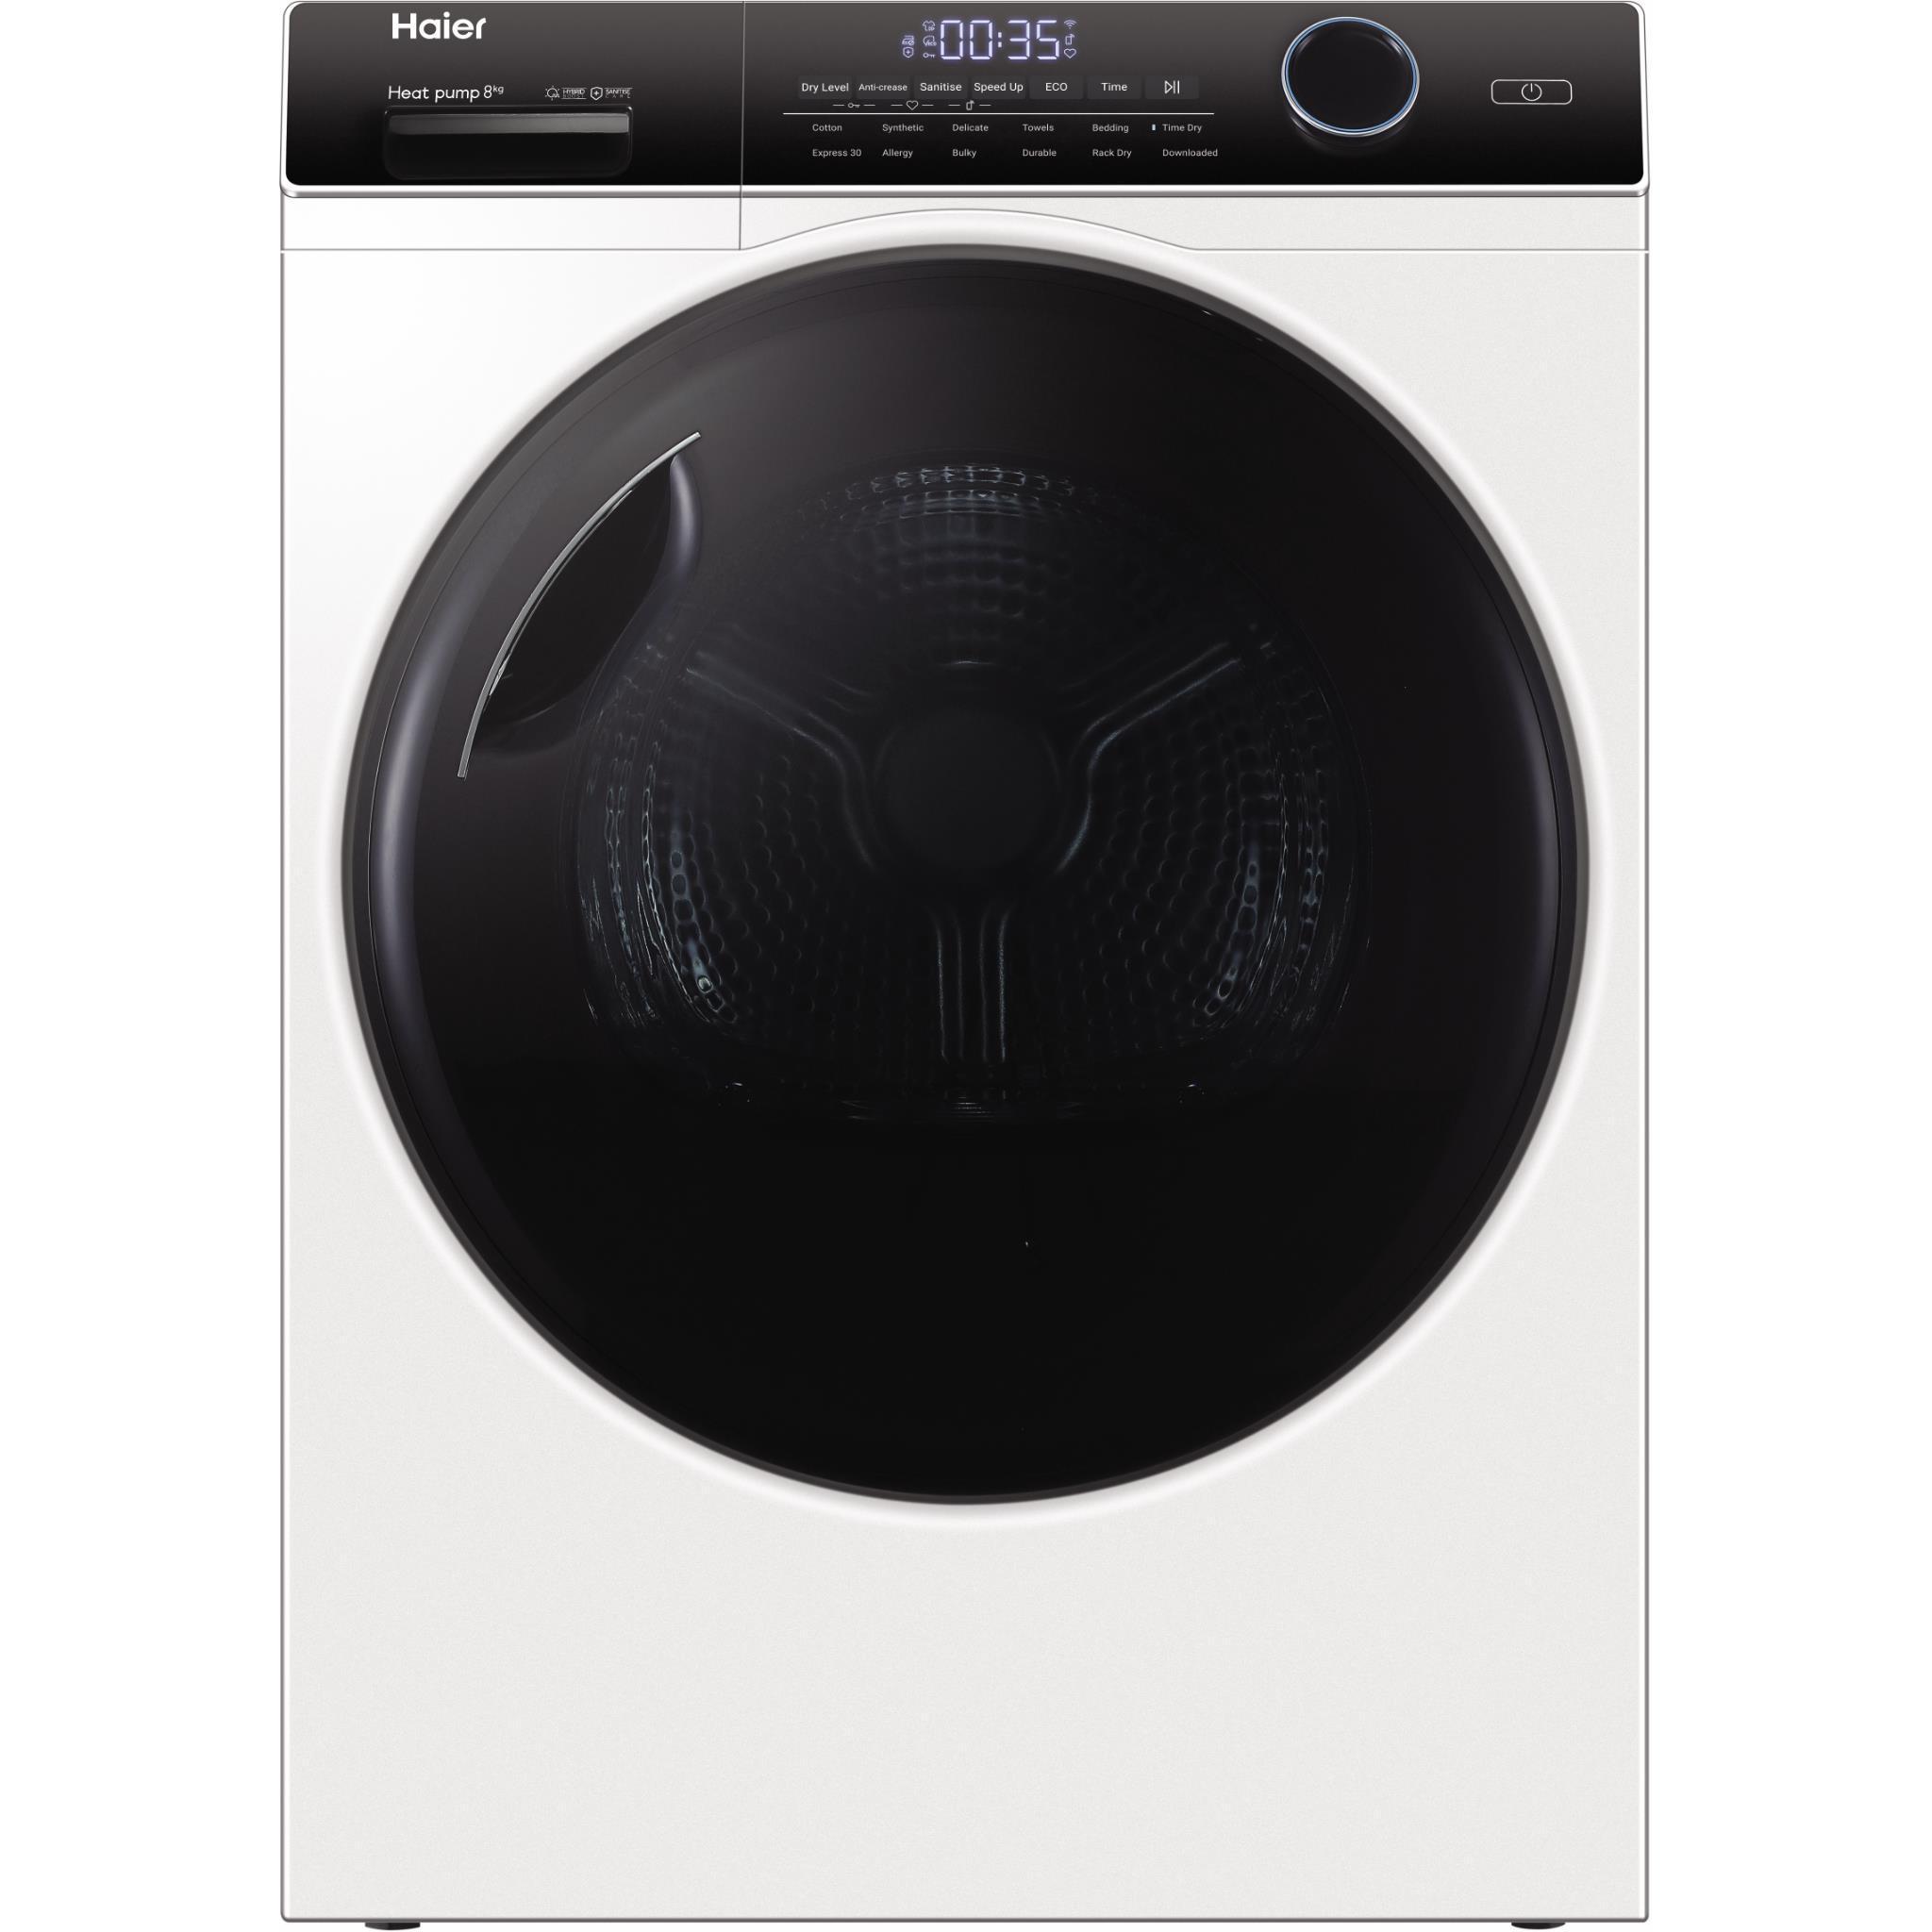 Haier HDHP80AN1 Dryer